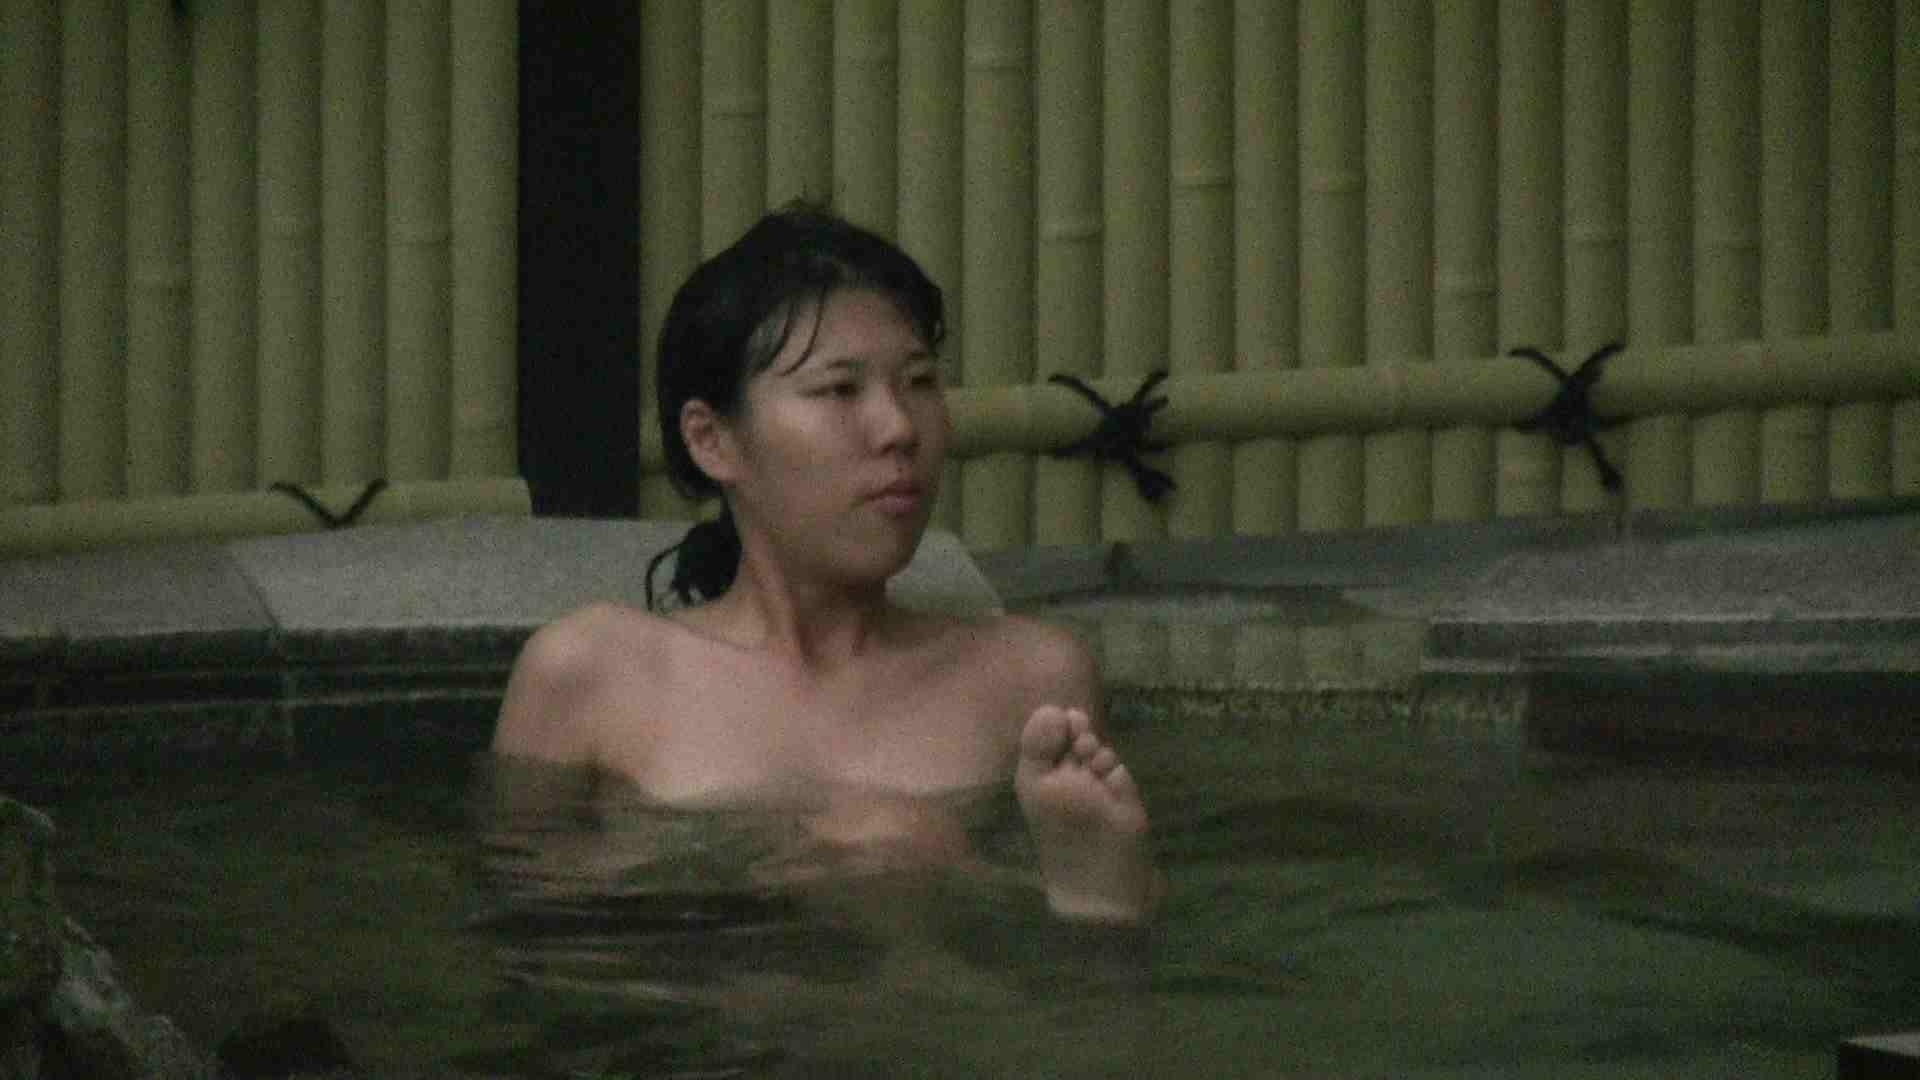 Aquaな露天風呂Vol.215 女体盗撮 盗撮戯れ無修正画像 74連発 32